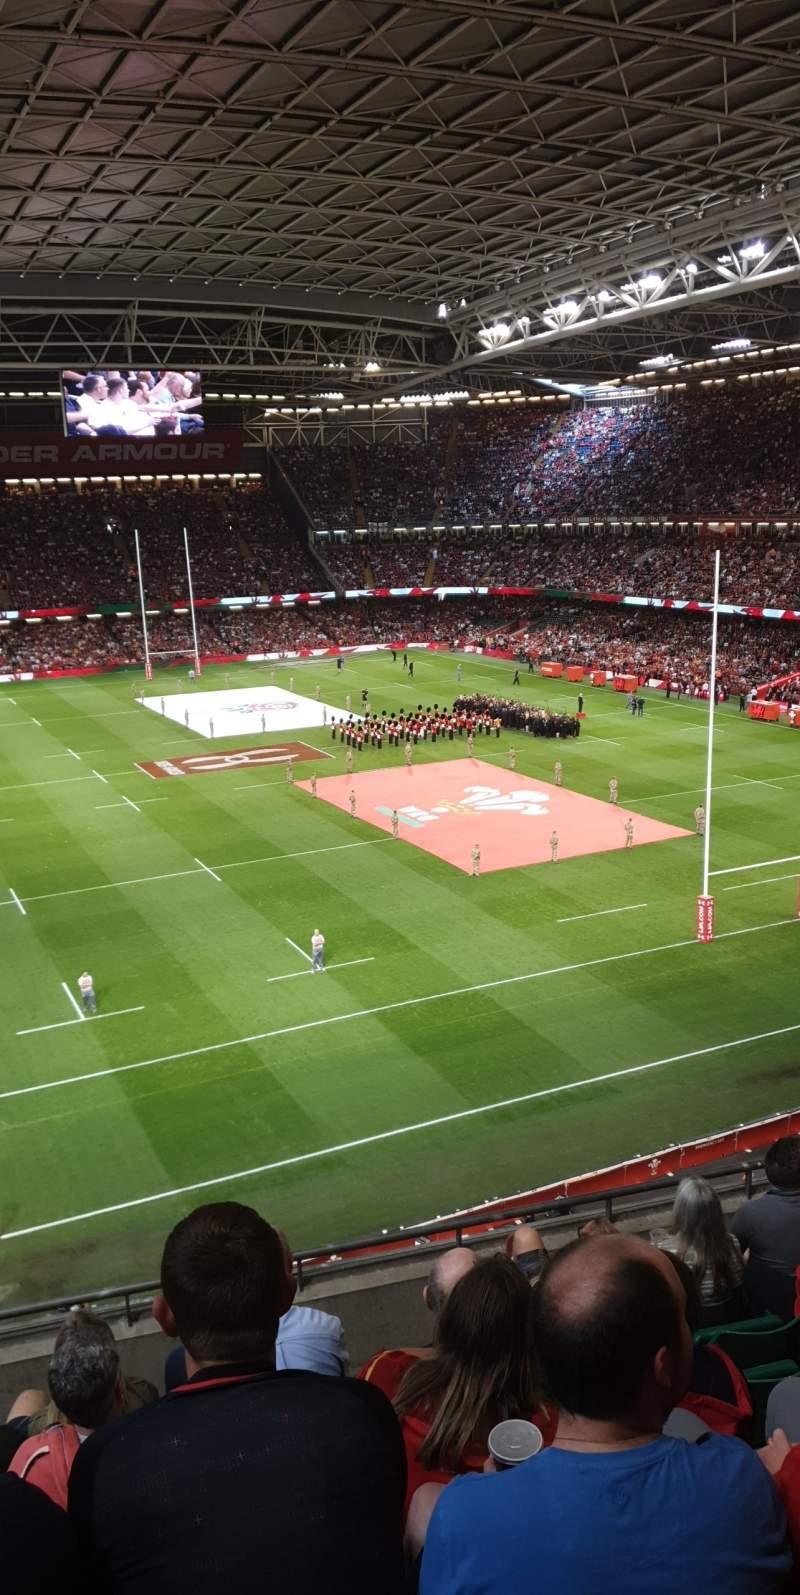 Seating view for Principality Stadium Section U22 Row 7 Seat 7